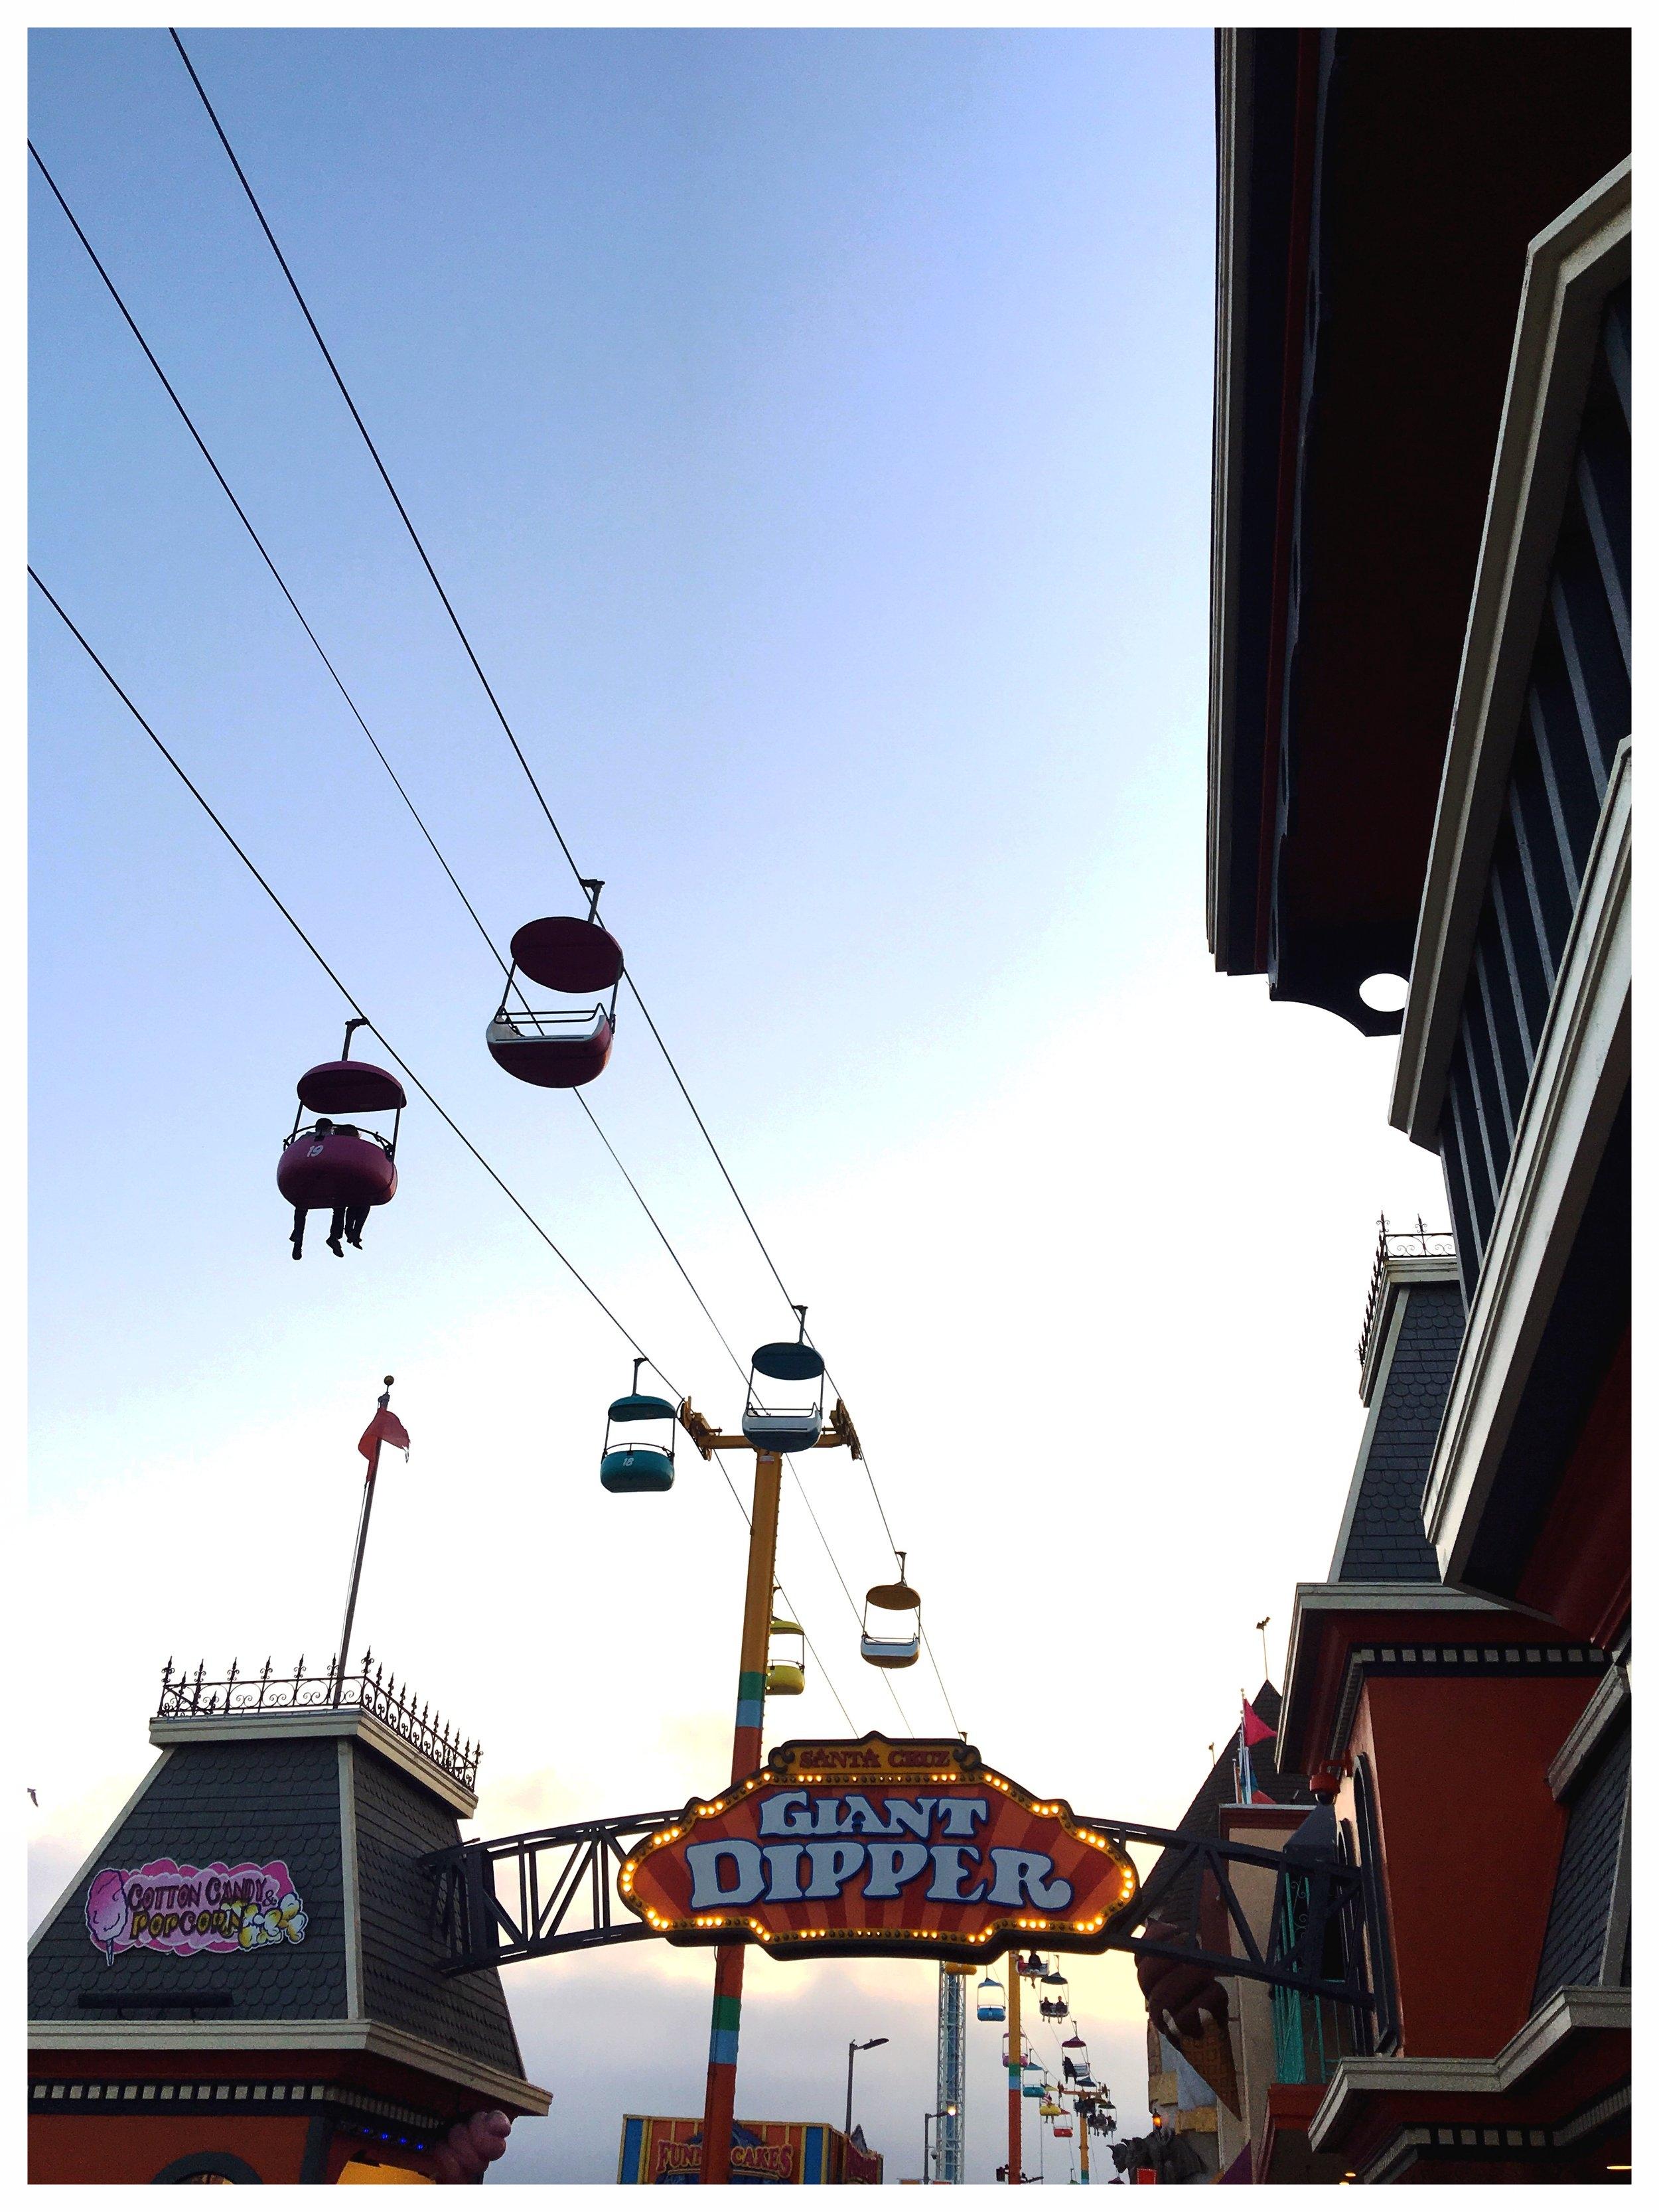 Santa Cruz Giant Dipper Roller Coaster